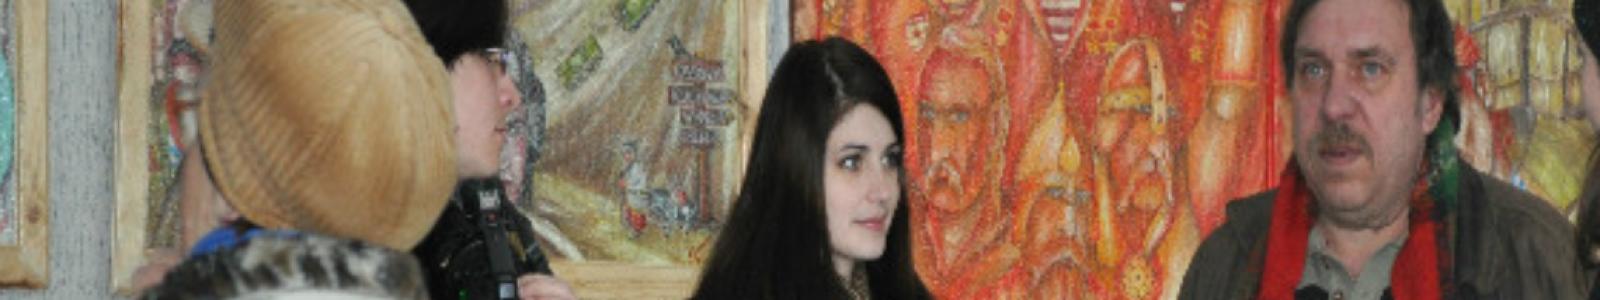 Gallery Painter Alik Danilov